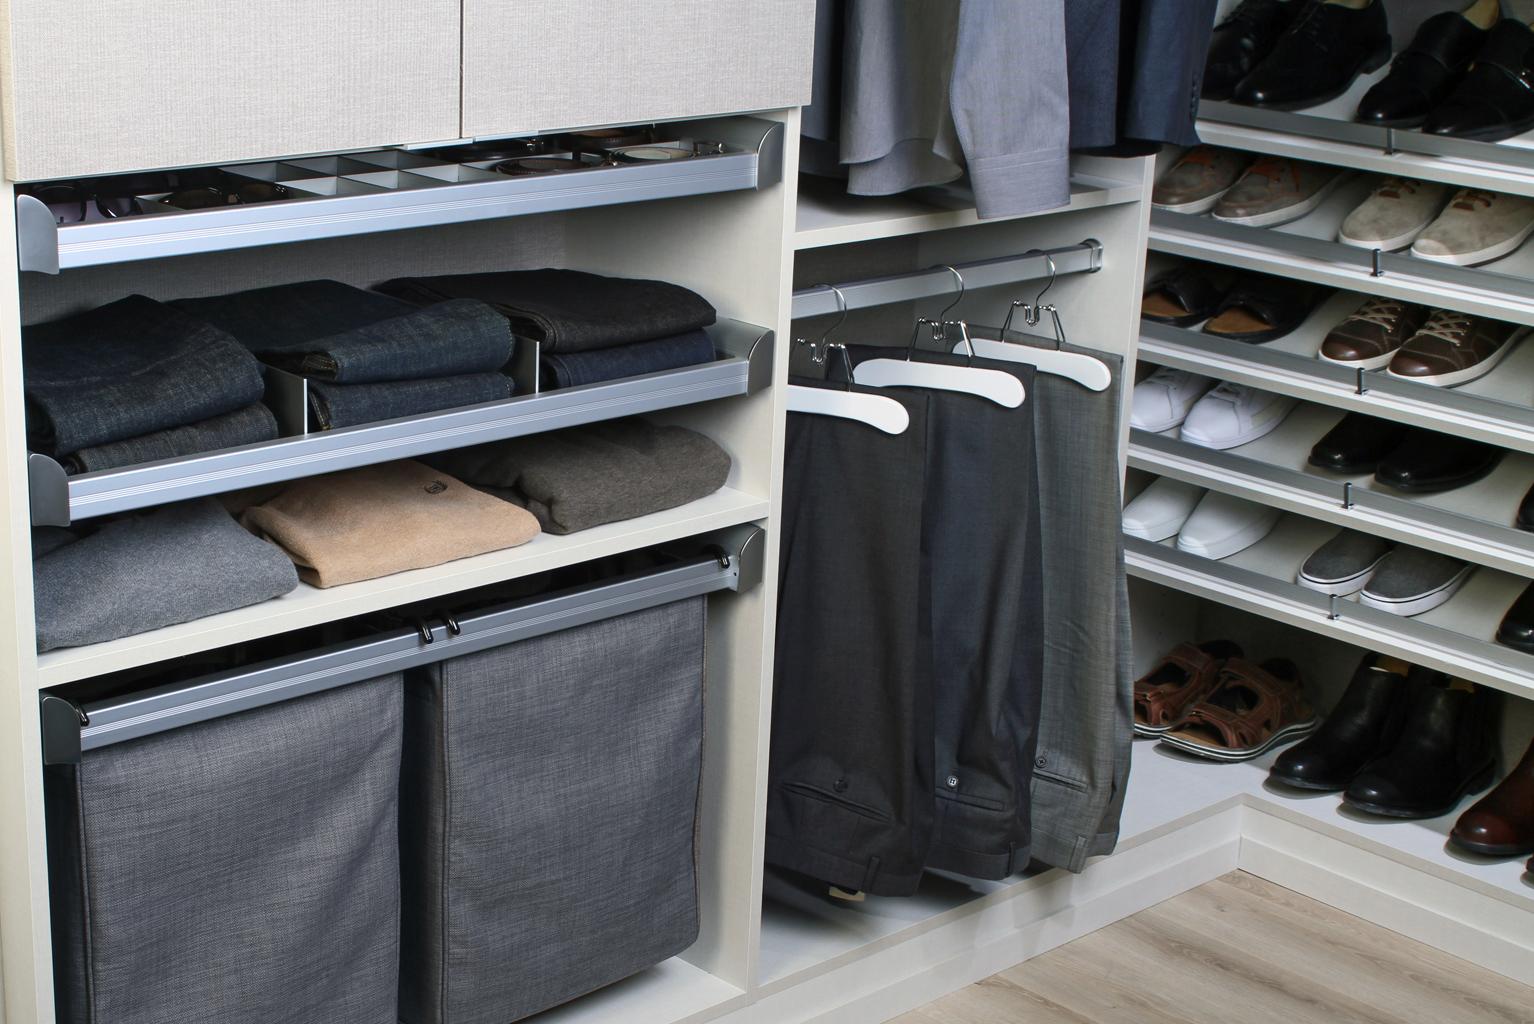 ENGAGE_Laundry-Organizer-2Bags_MAL